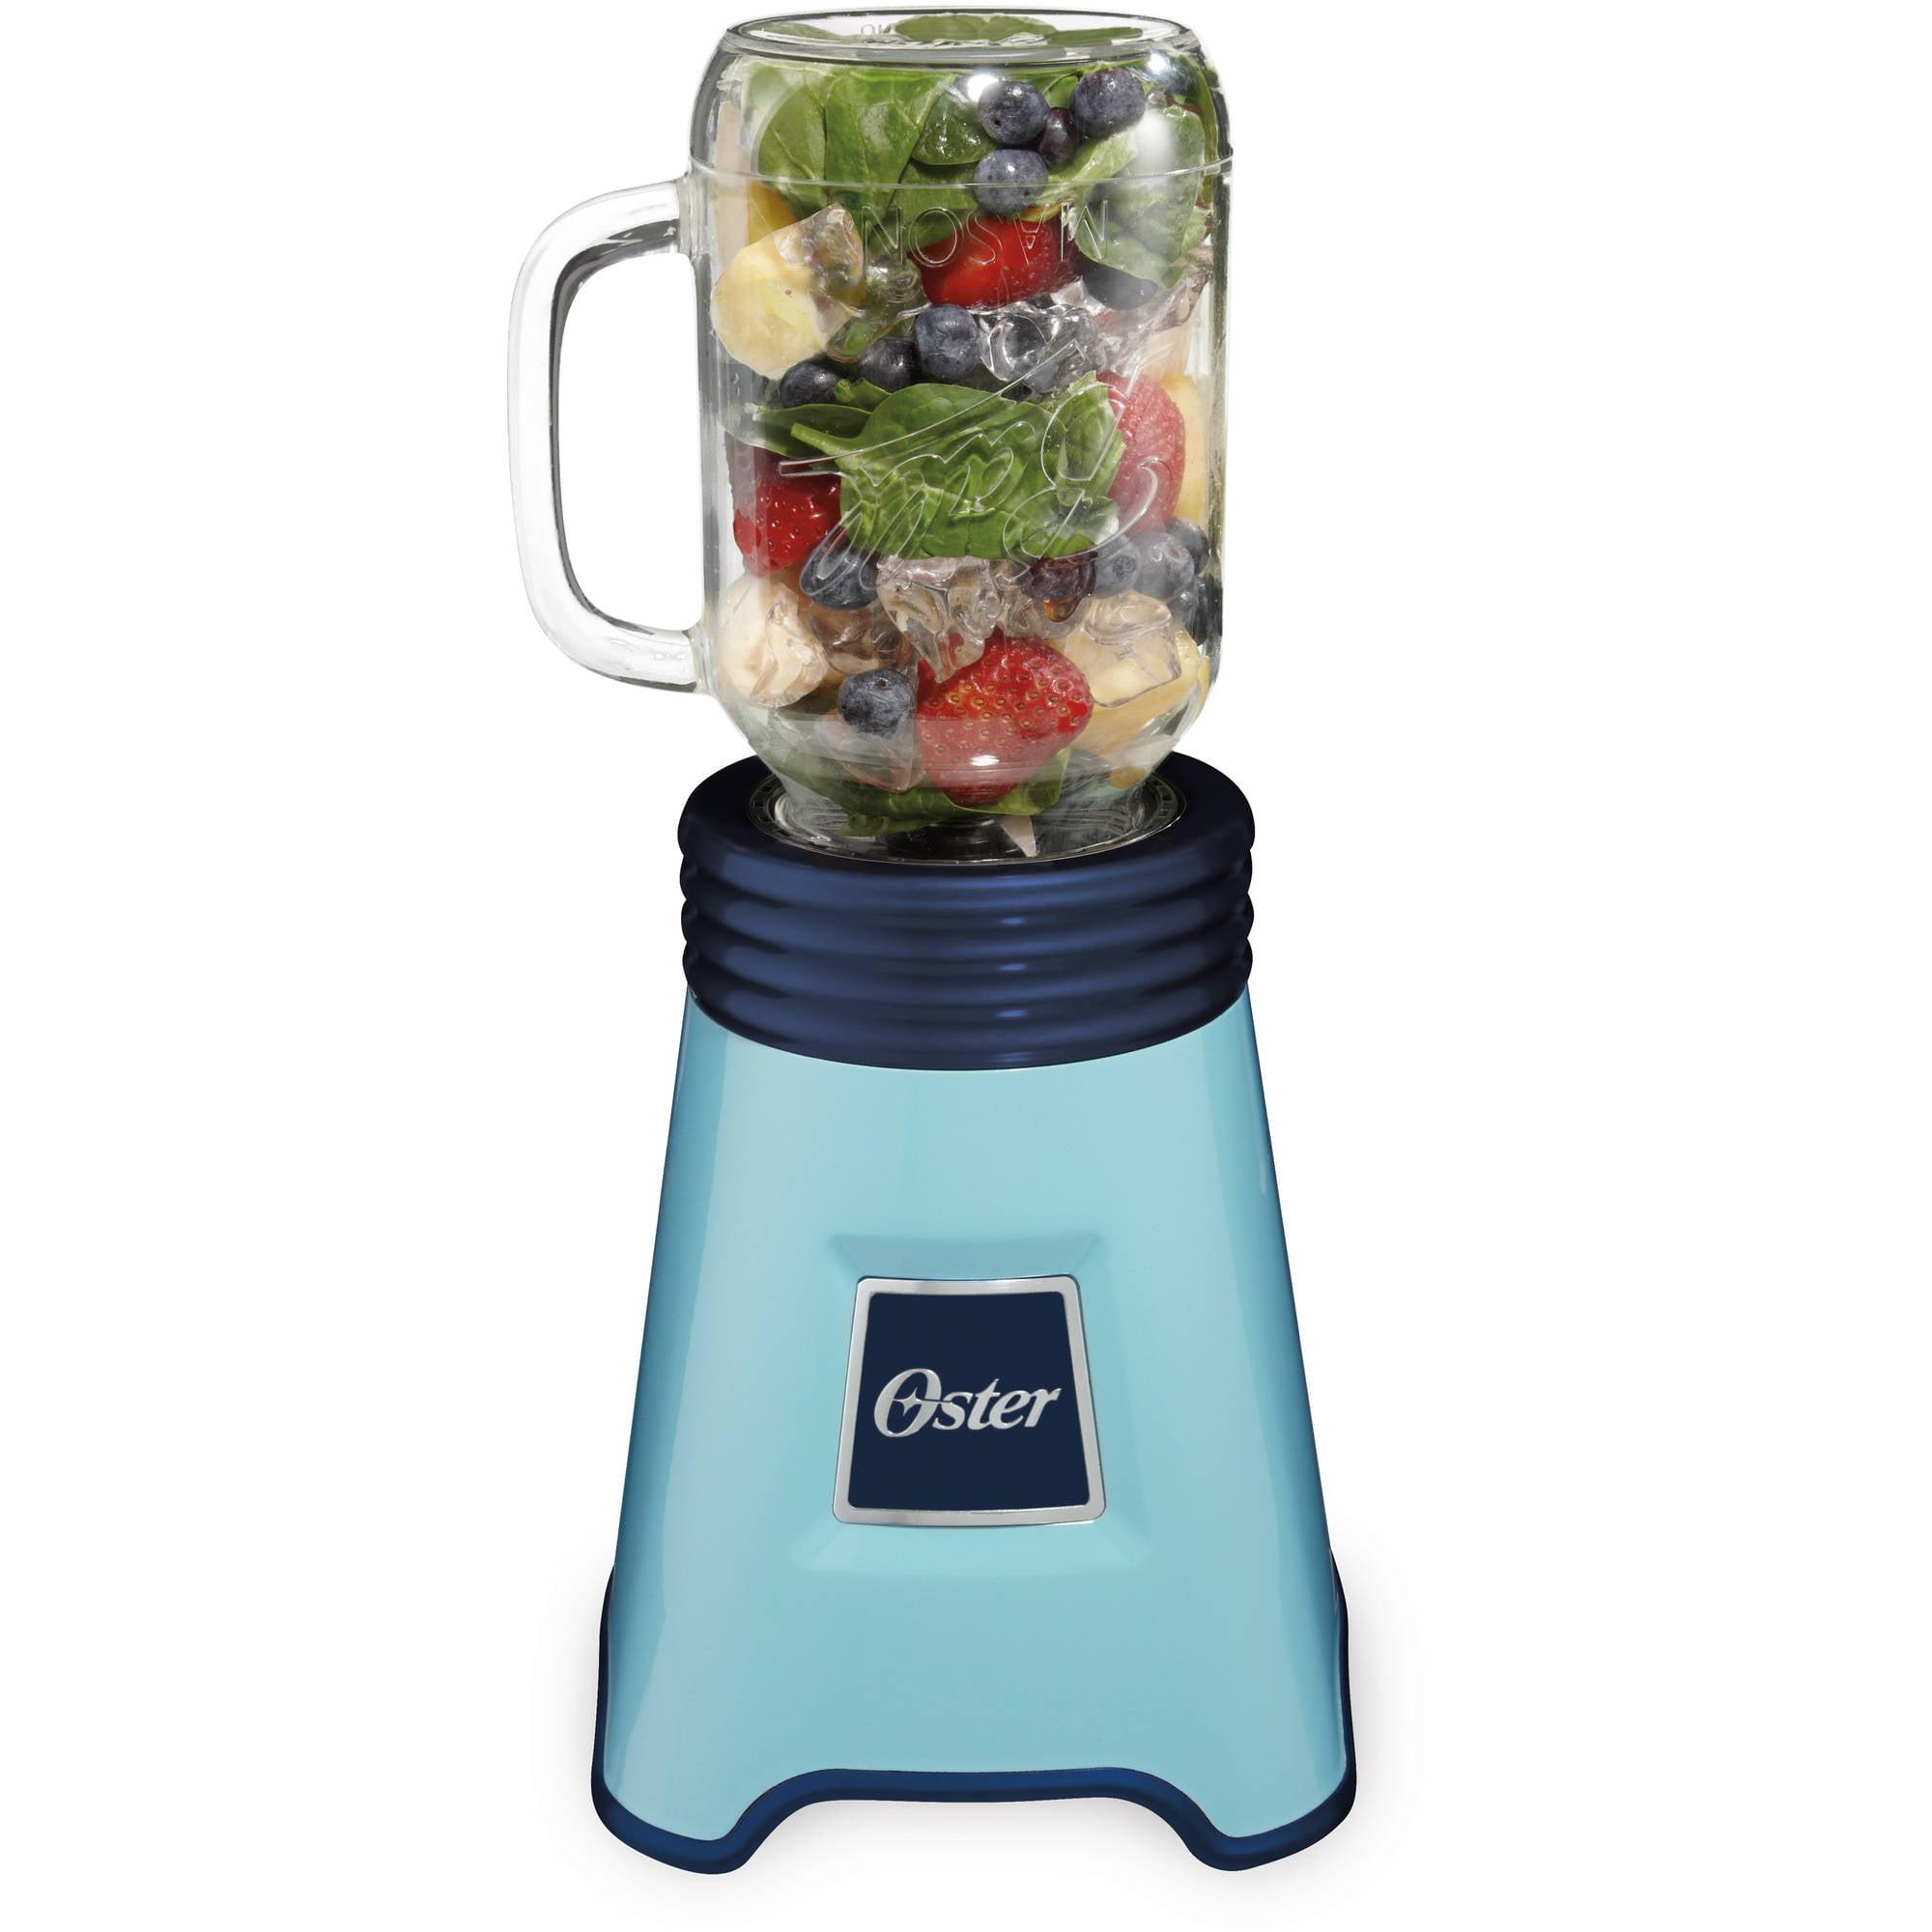 Oster Fresh Blend N' Go Mason Jar Blender